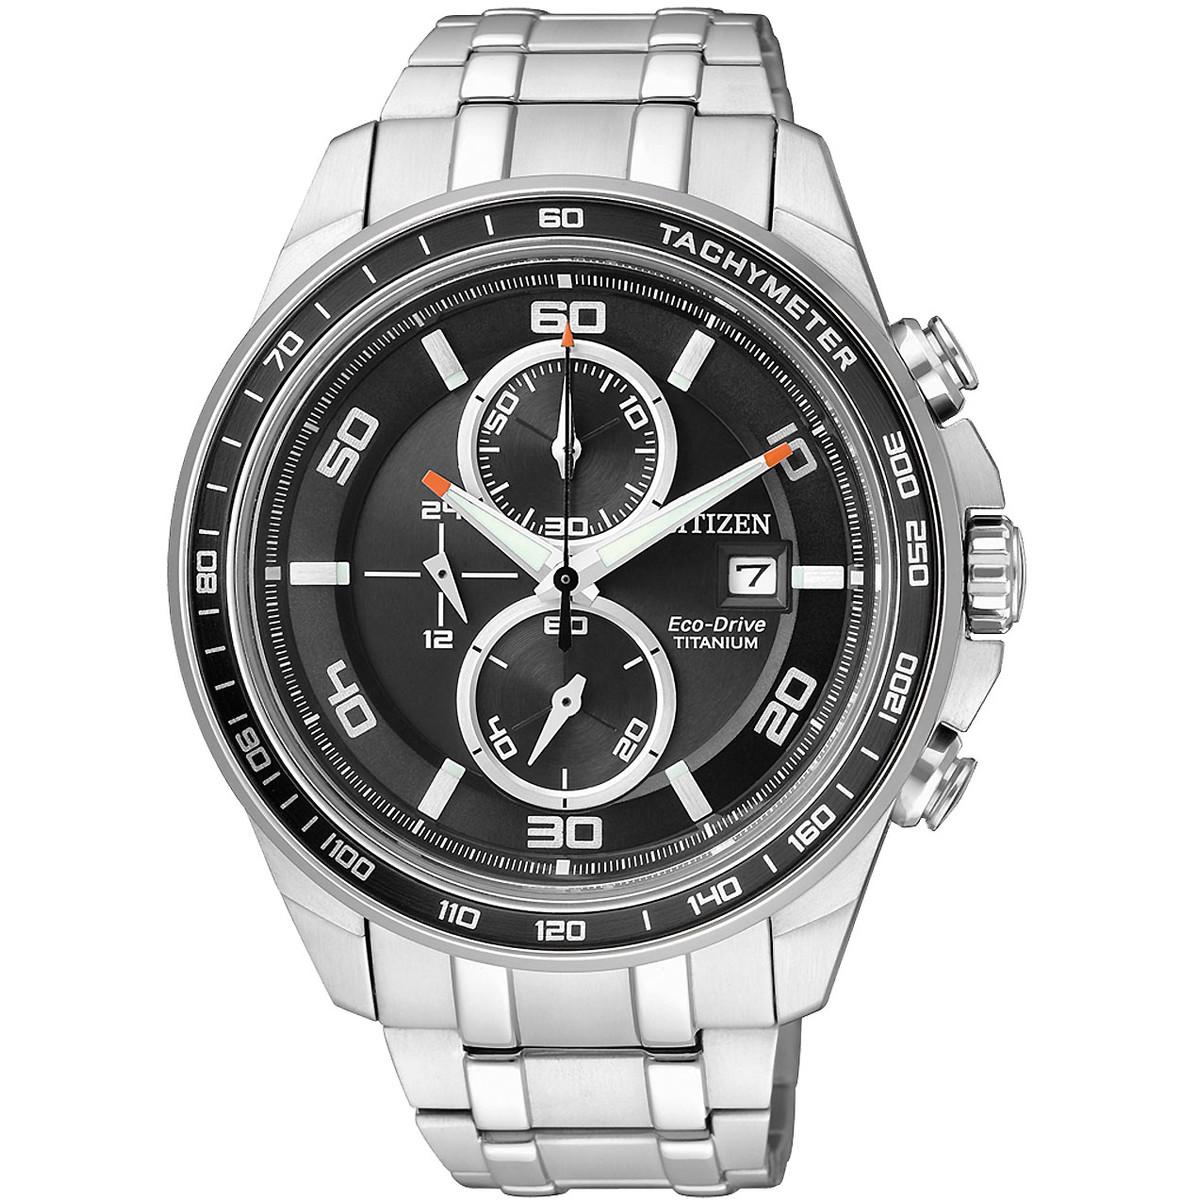 Ceas barbatesc Citizen Super Titanium CA0340-55E de mana original